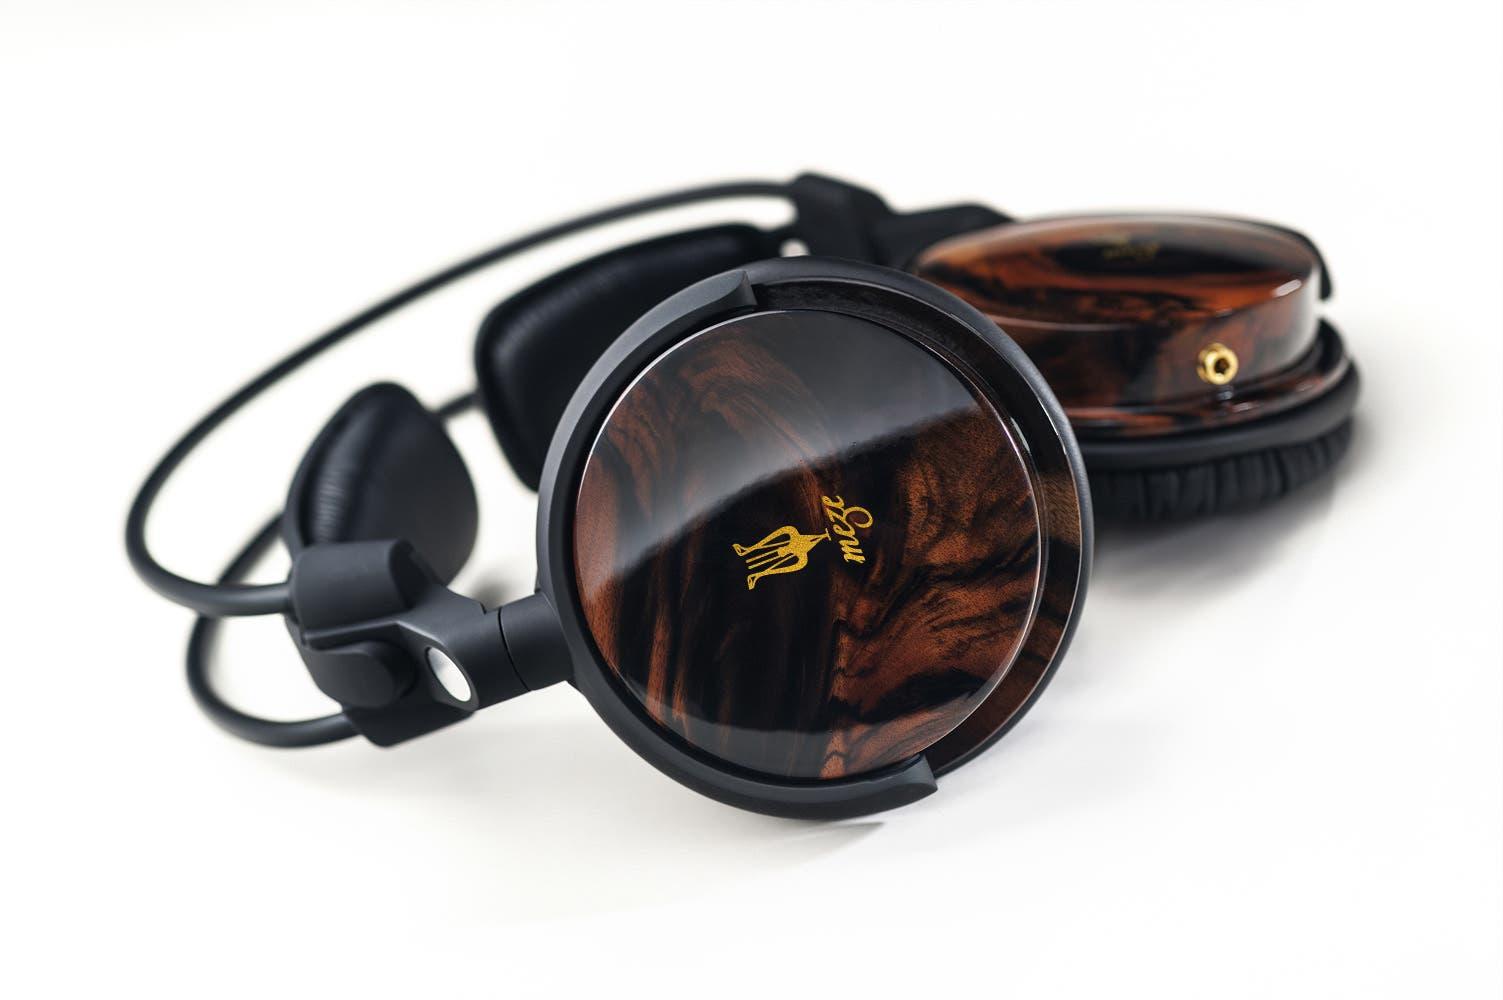 High End Headphones >> Meze 88 Classics High End Ebony Headphones For The Discerning